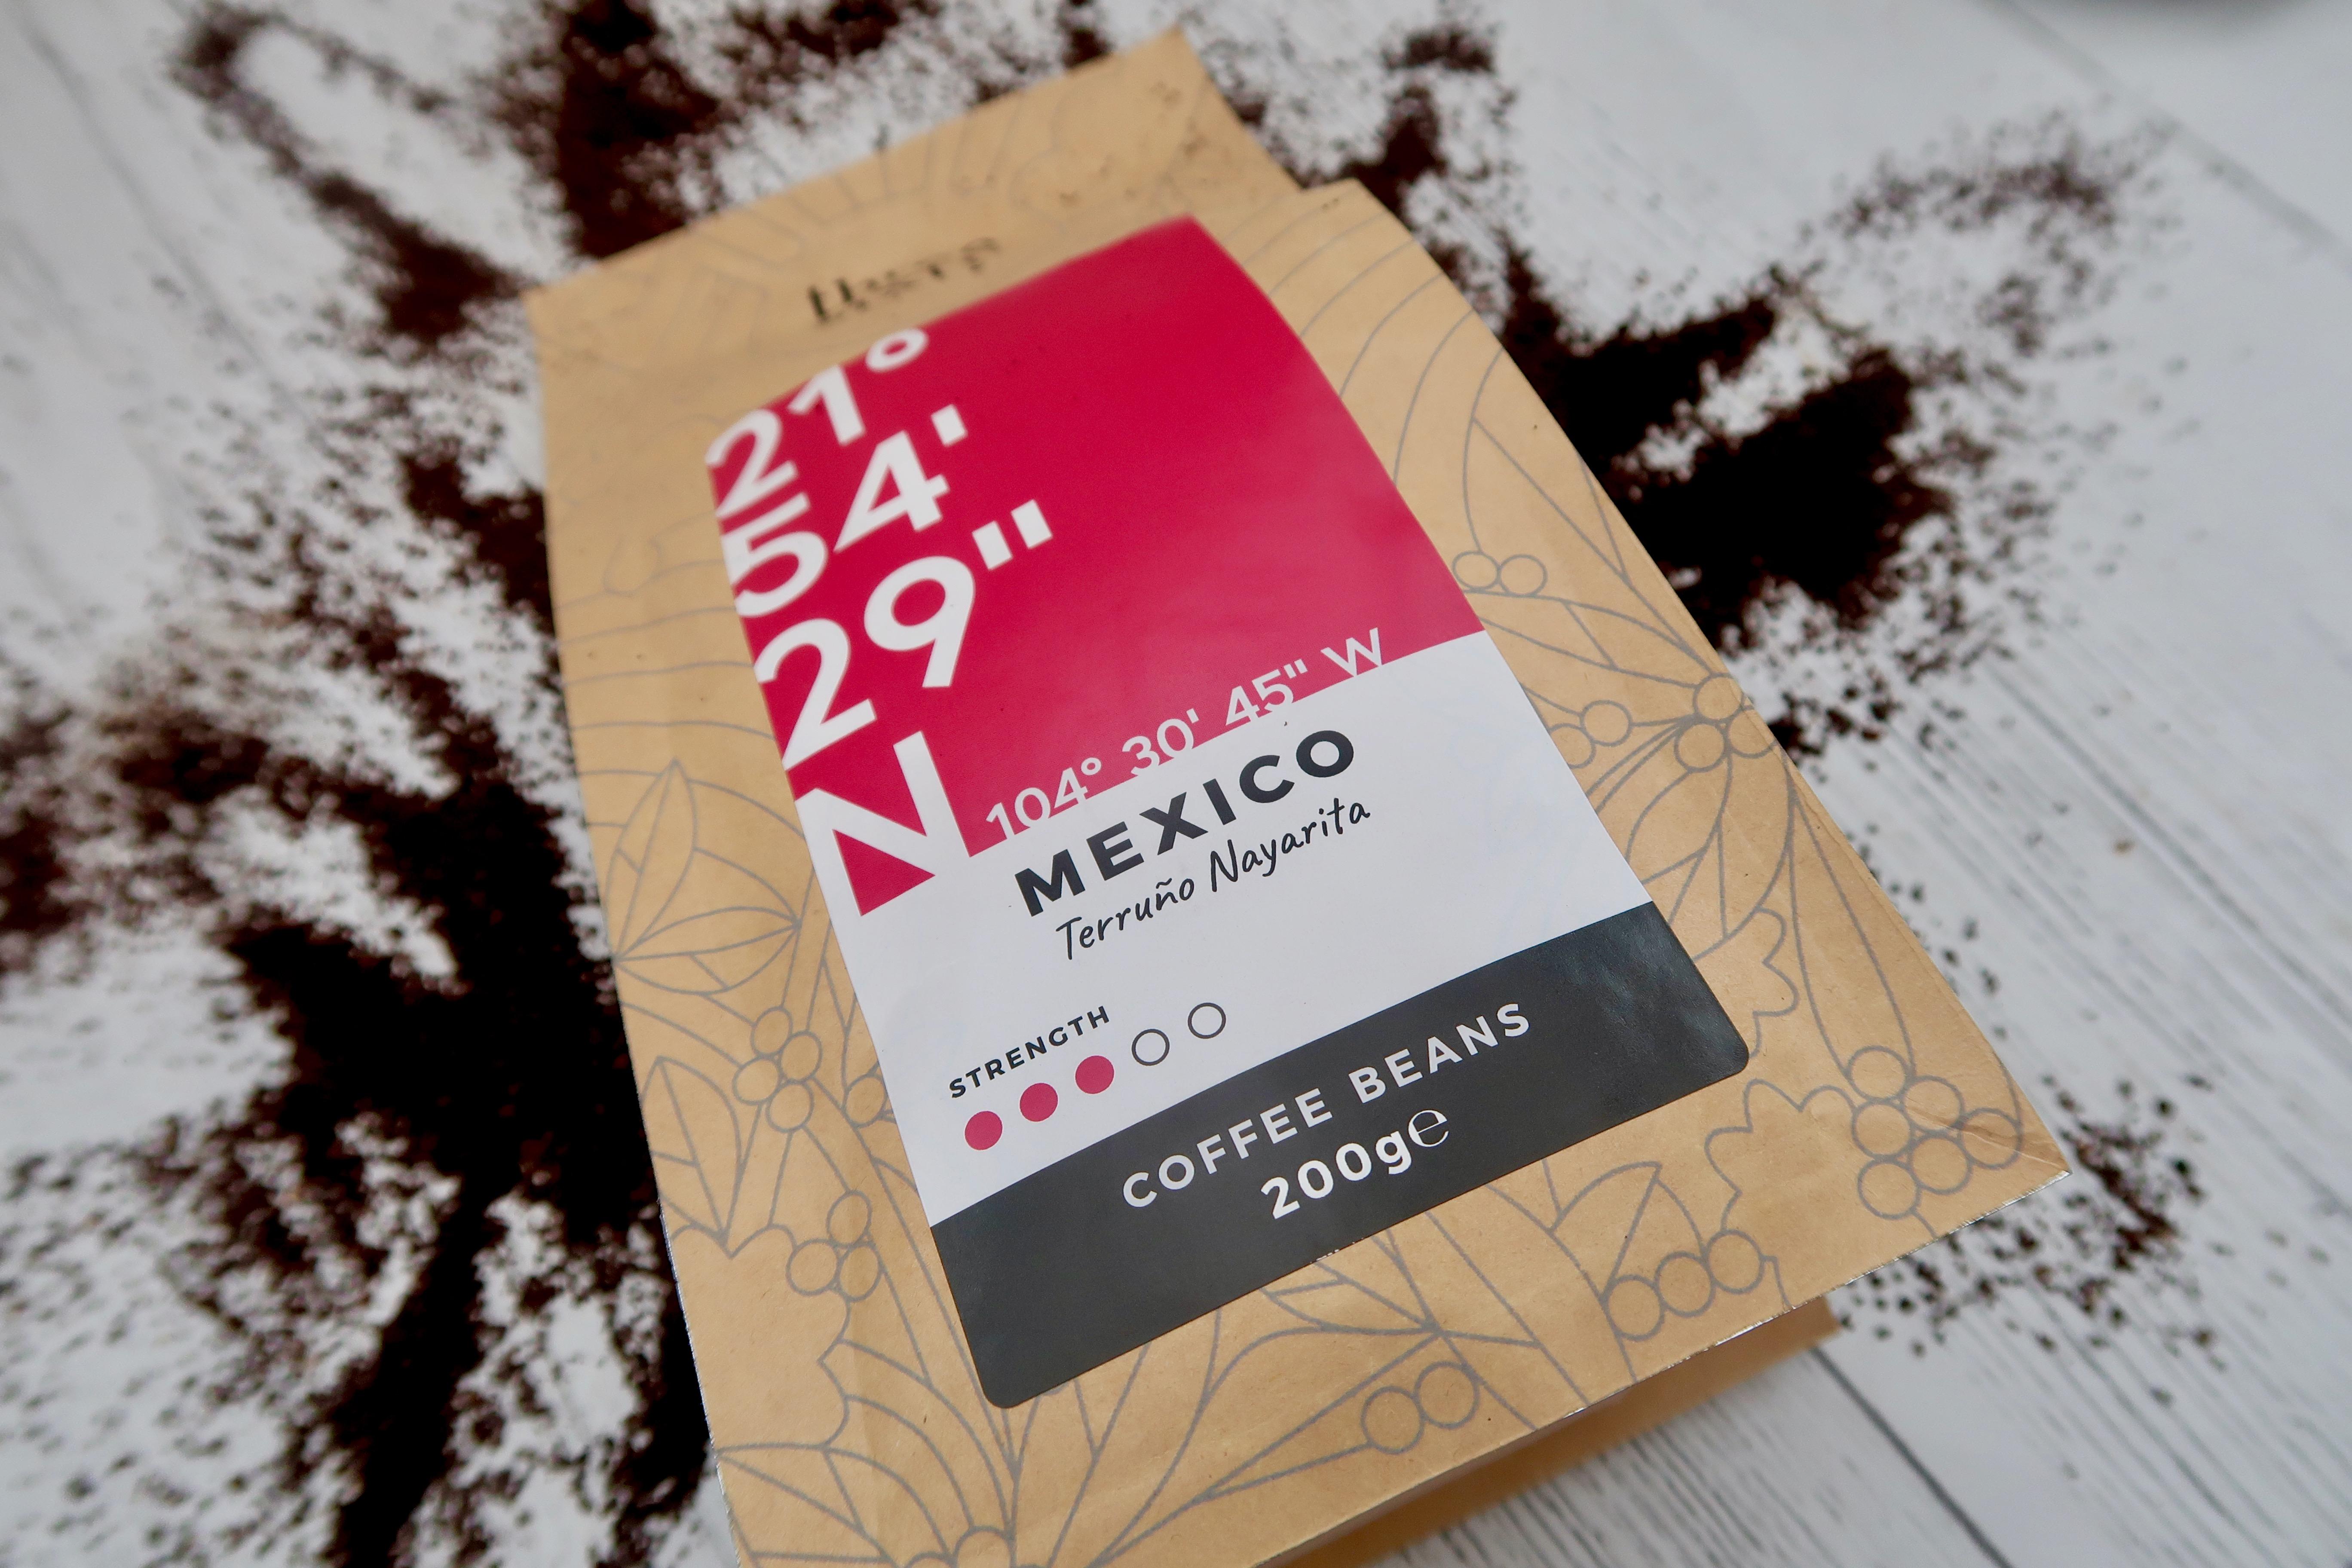 ThreeSixty° Coffee - Fair Trade and Organic Coffee from Peru, Cuba and Mexico 2